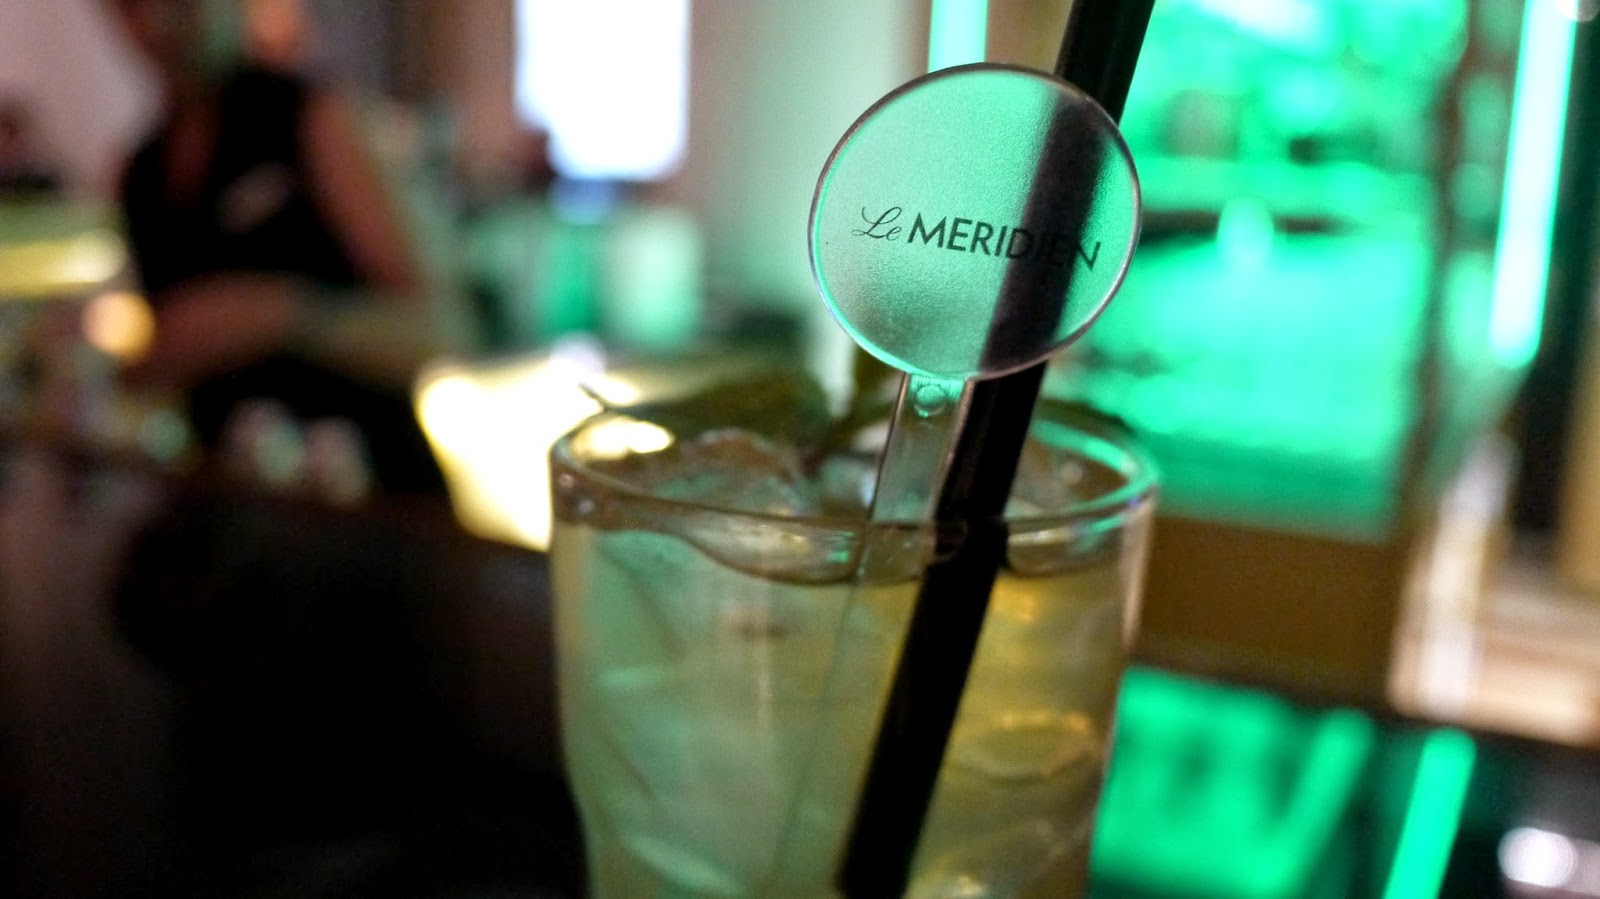 Le Meridien Budapest cocktail bar